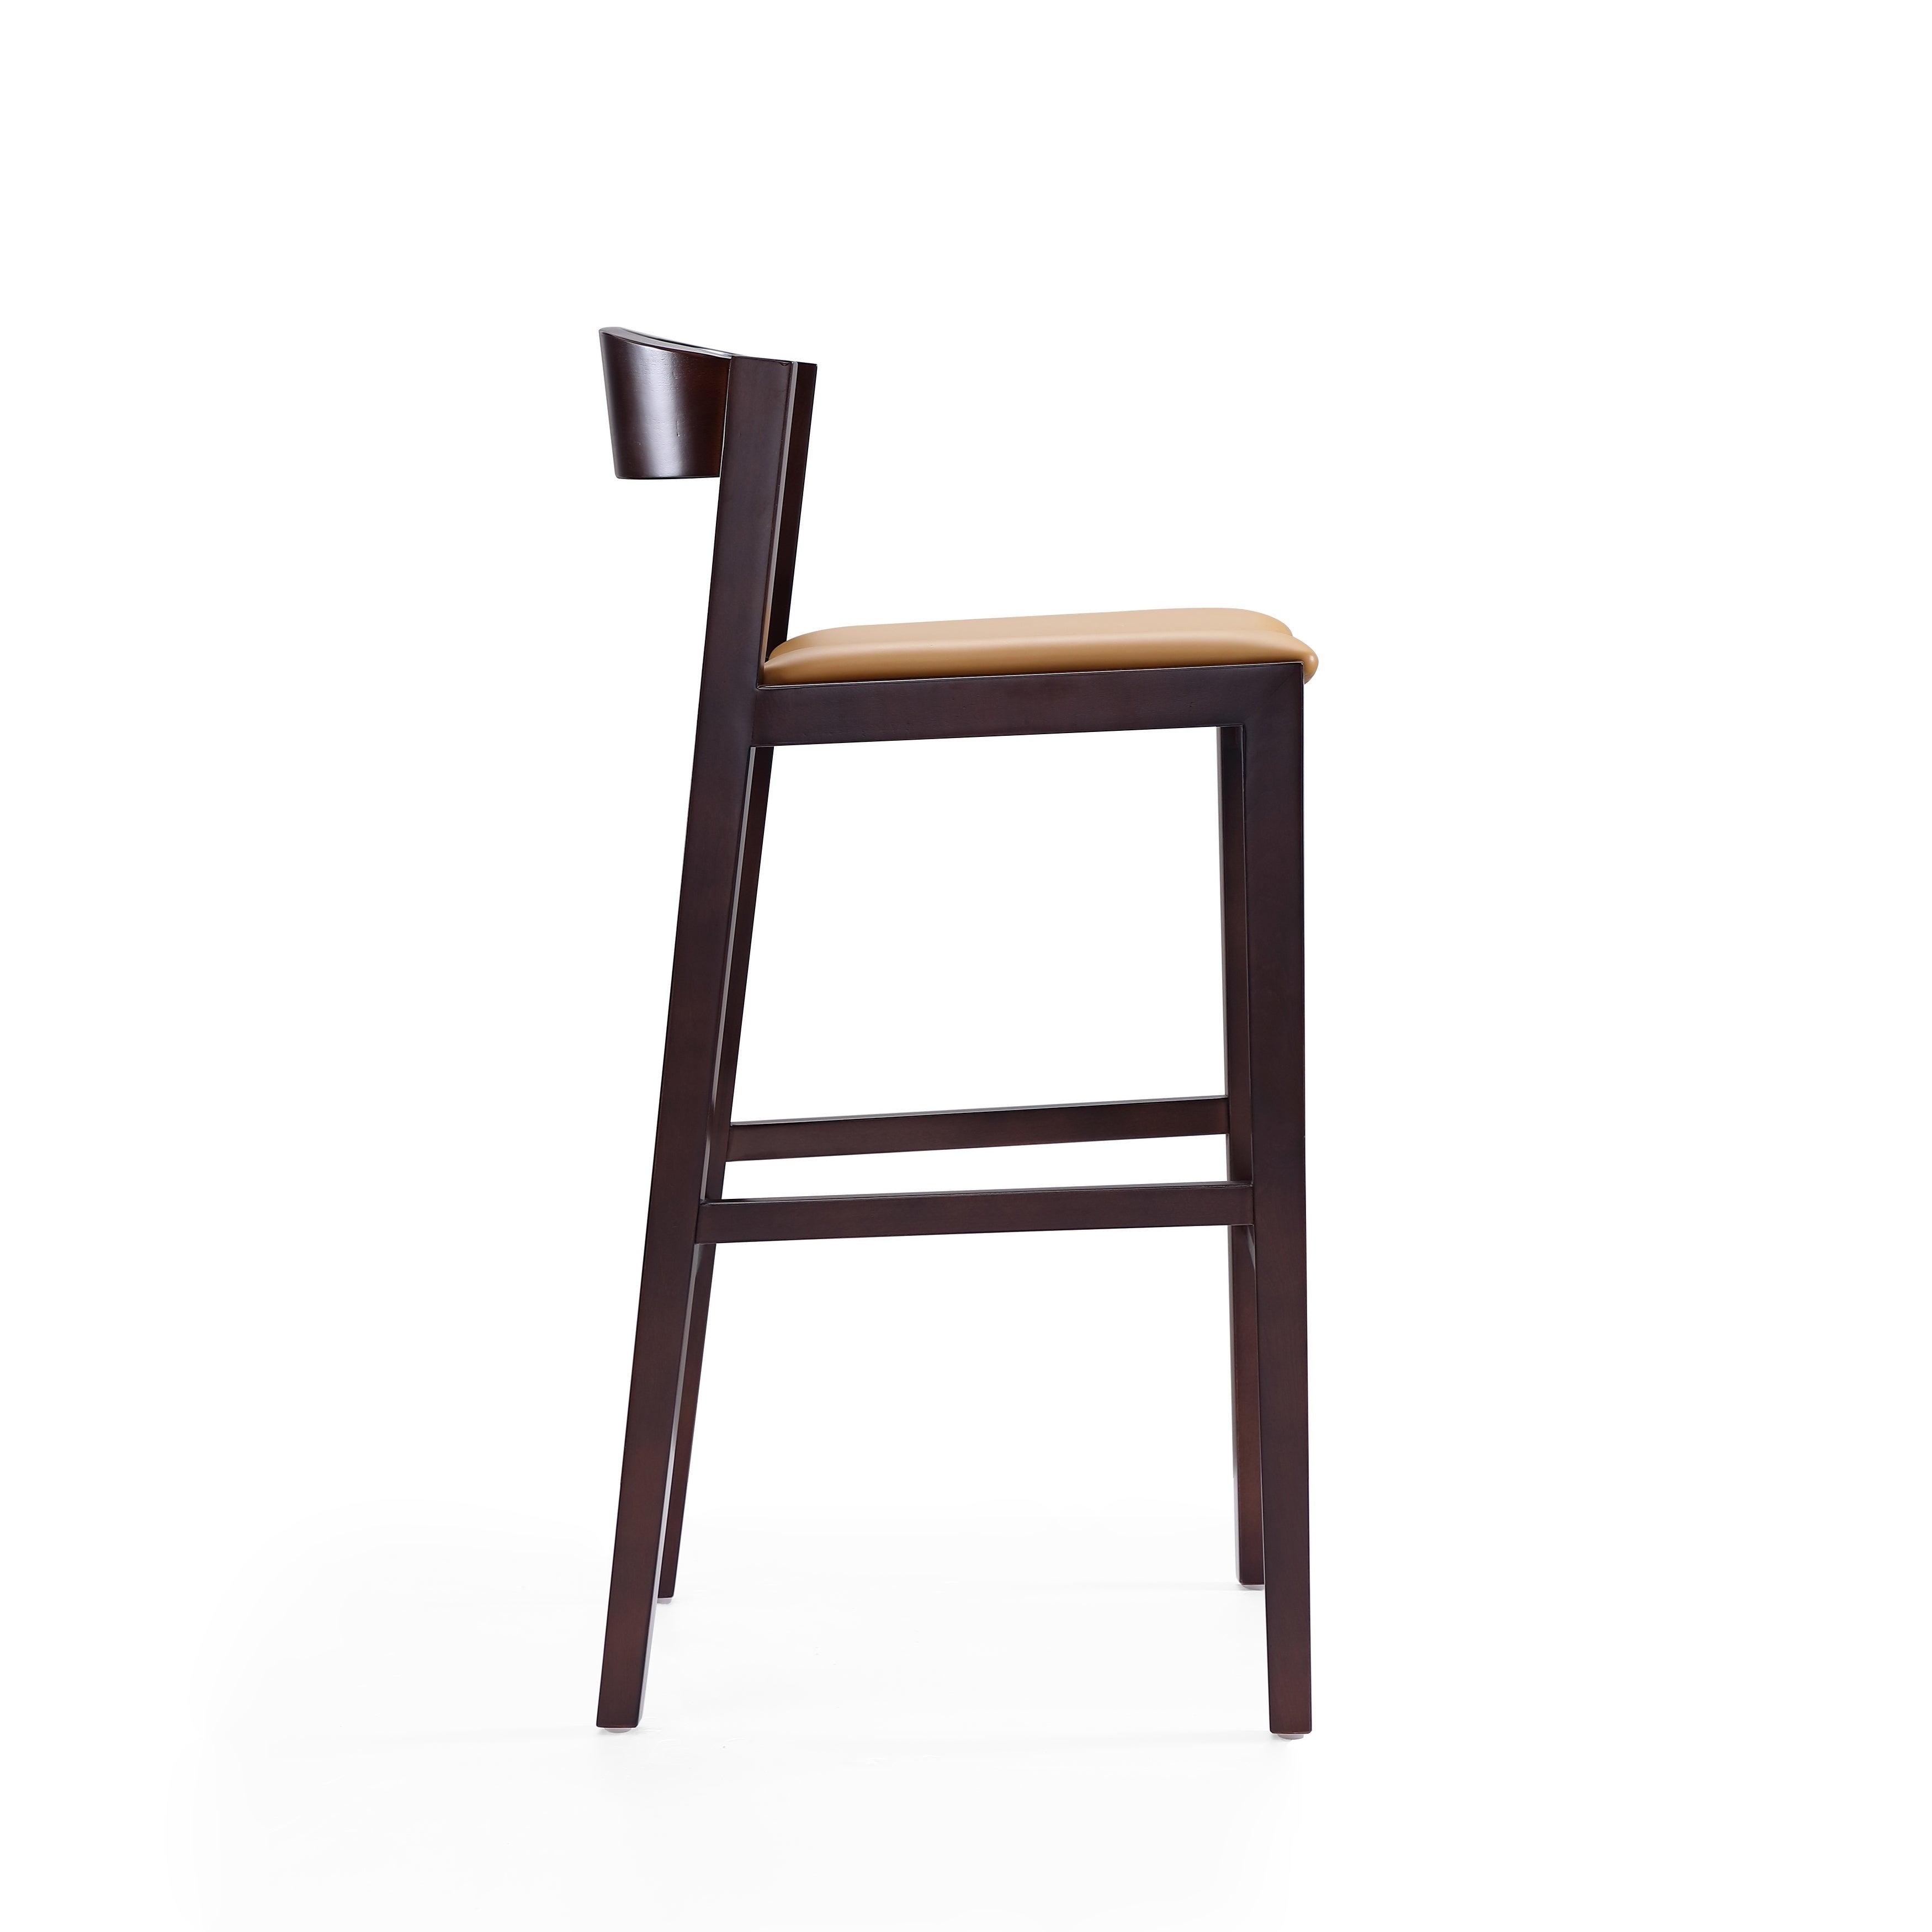 Super Ceets Modern And Sleek Klismos Bar Stool Inzonedesignstudio Interior Chair Design Inzonedesignstudiocom